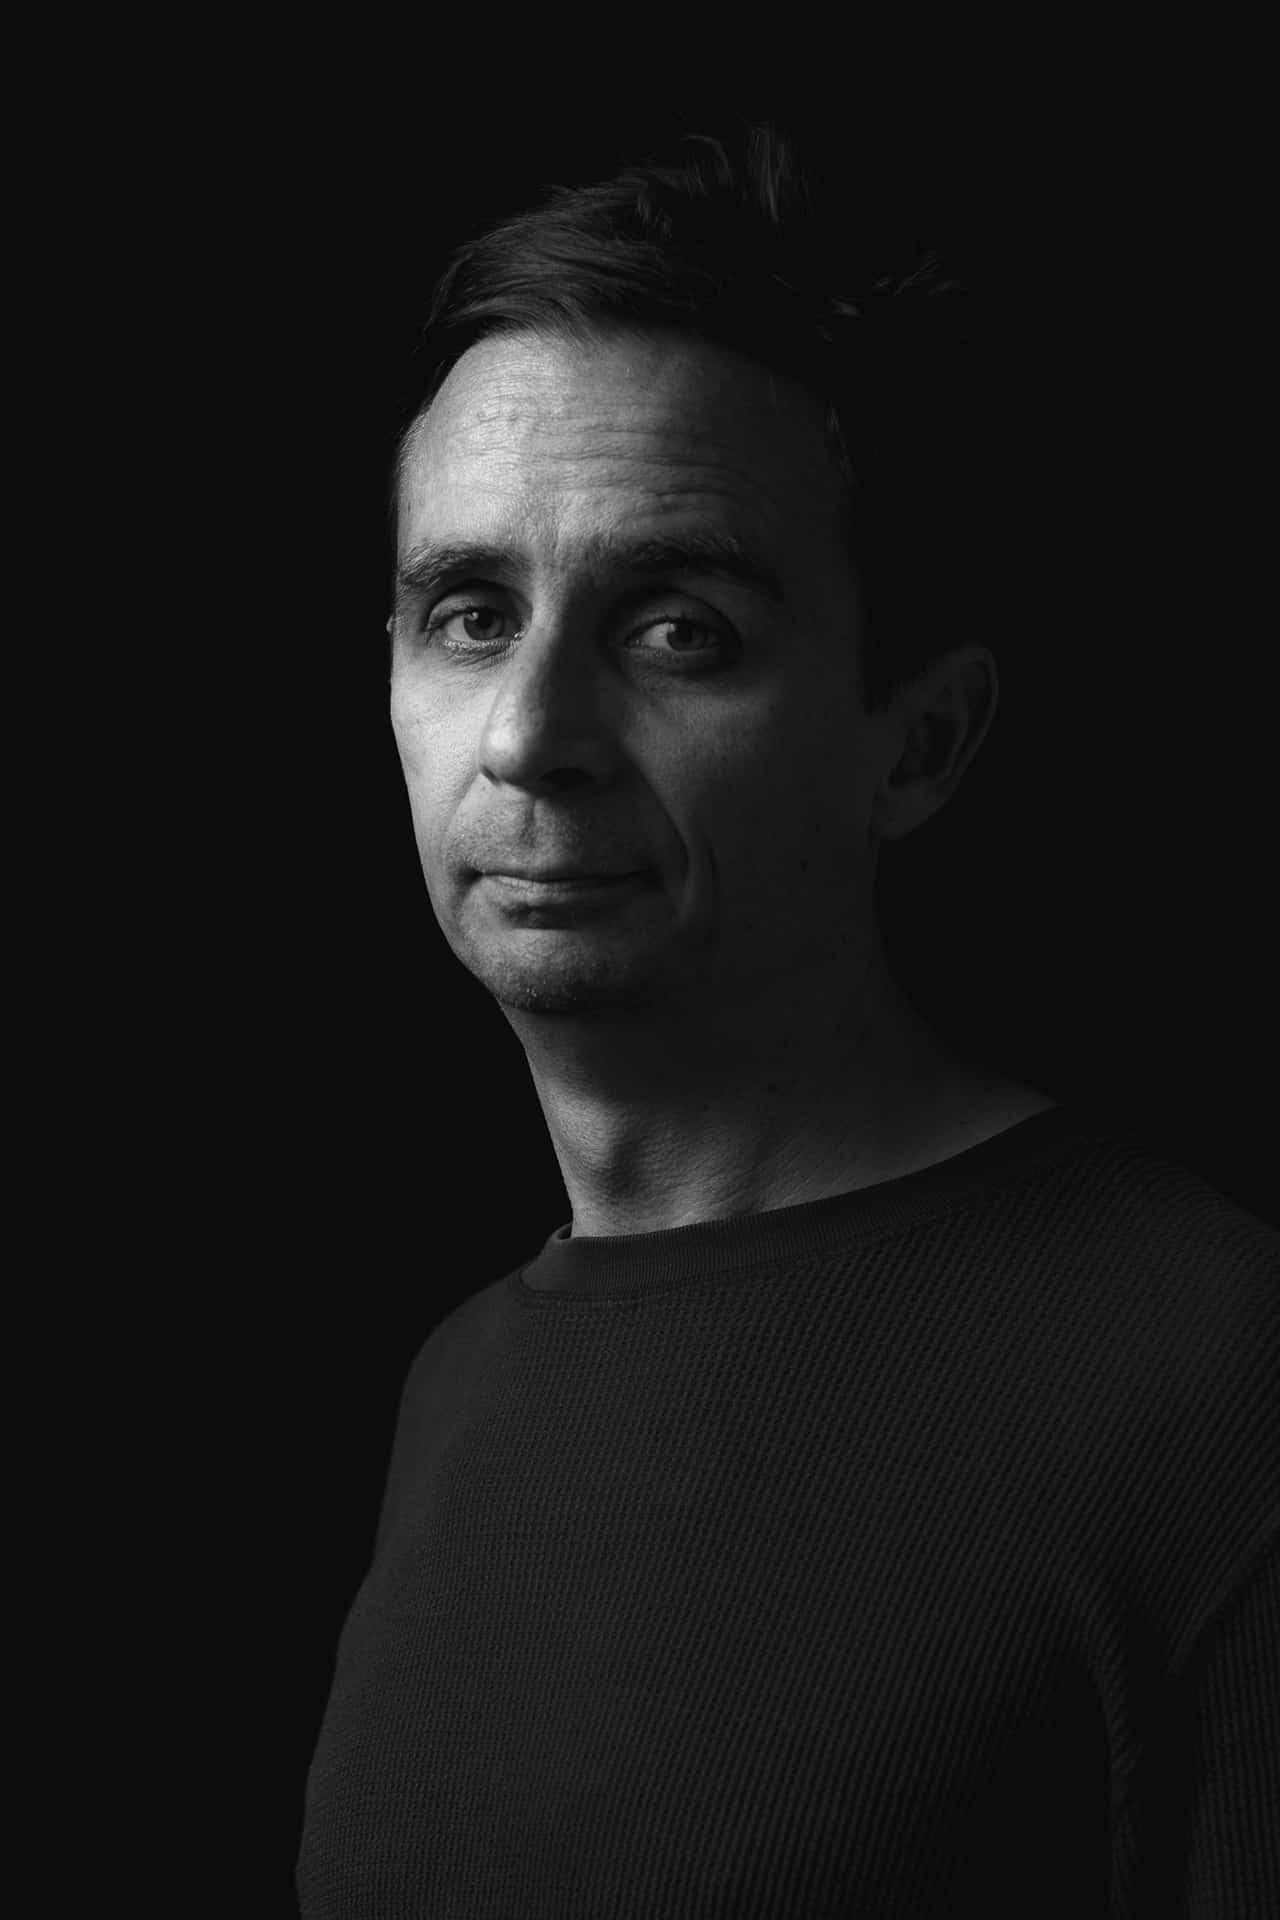 Damien-Kloot-Self-Portrait-Rembrandt-Style